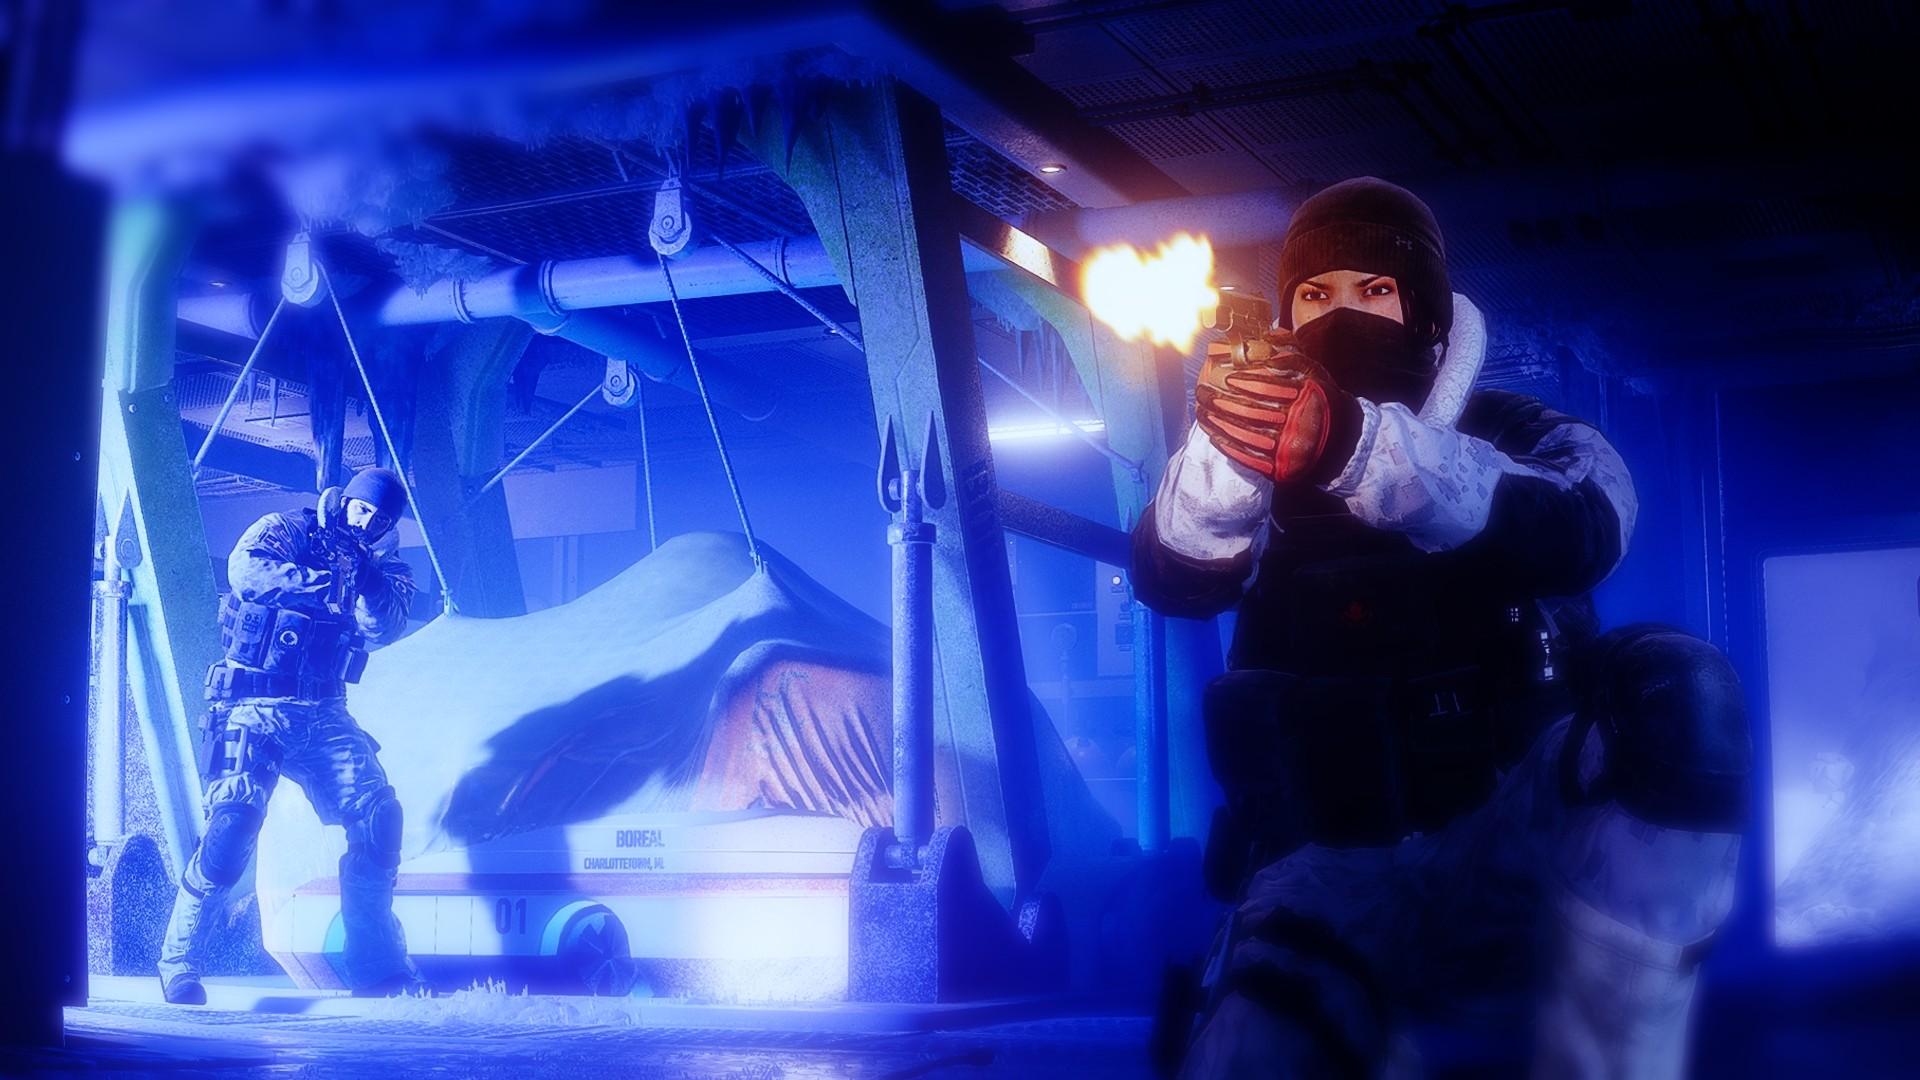 General 1920x1080 Rainbow Six: Siege SWAT video games gun video game art